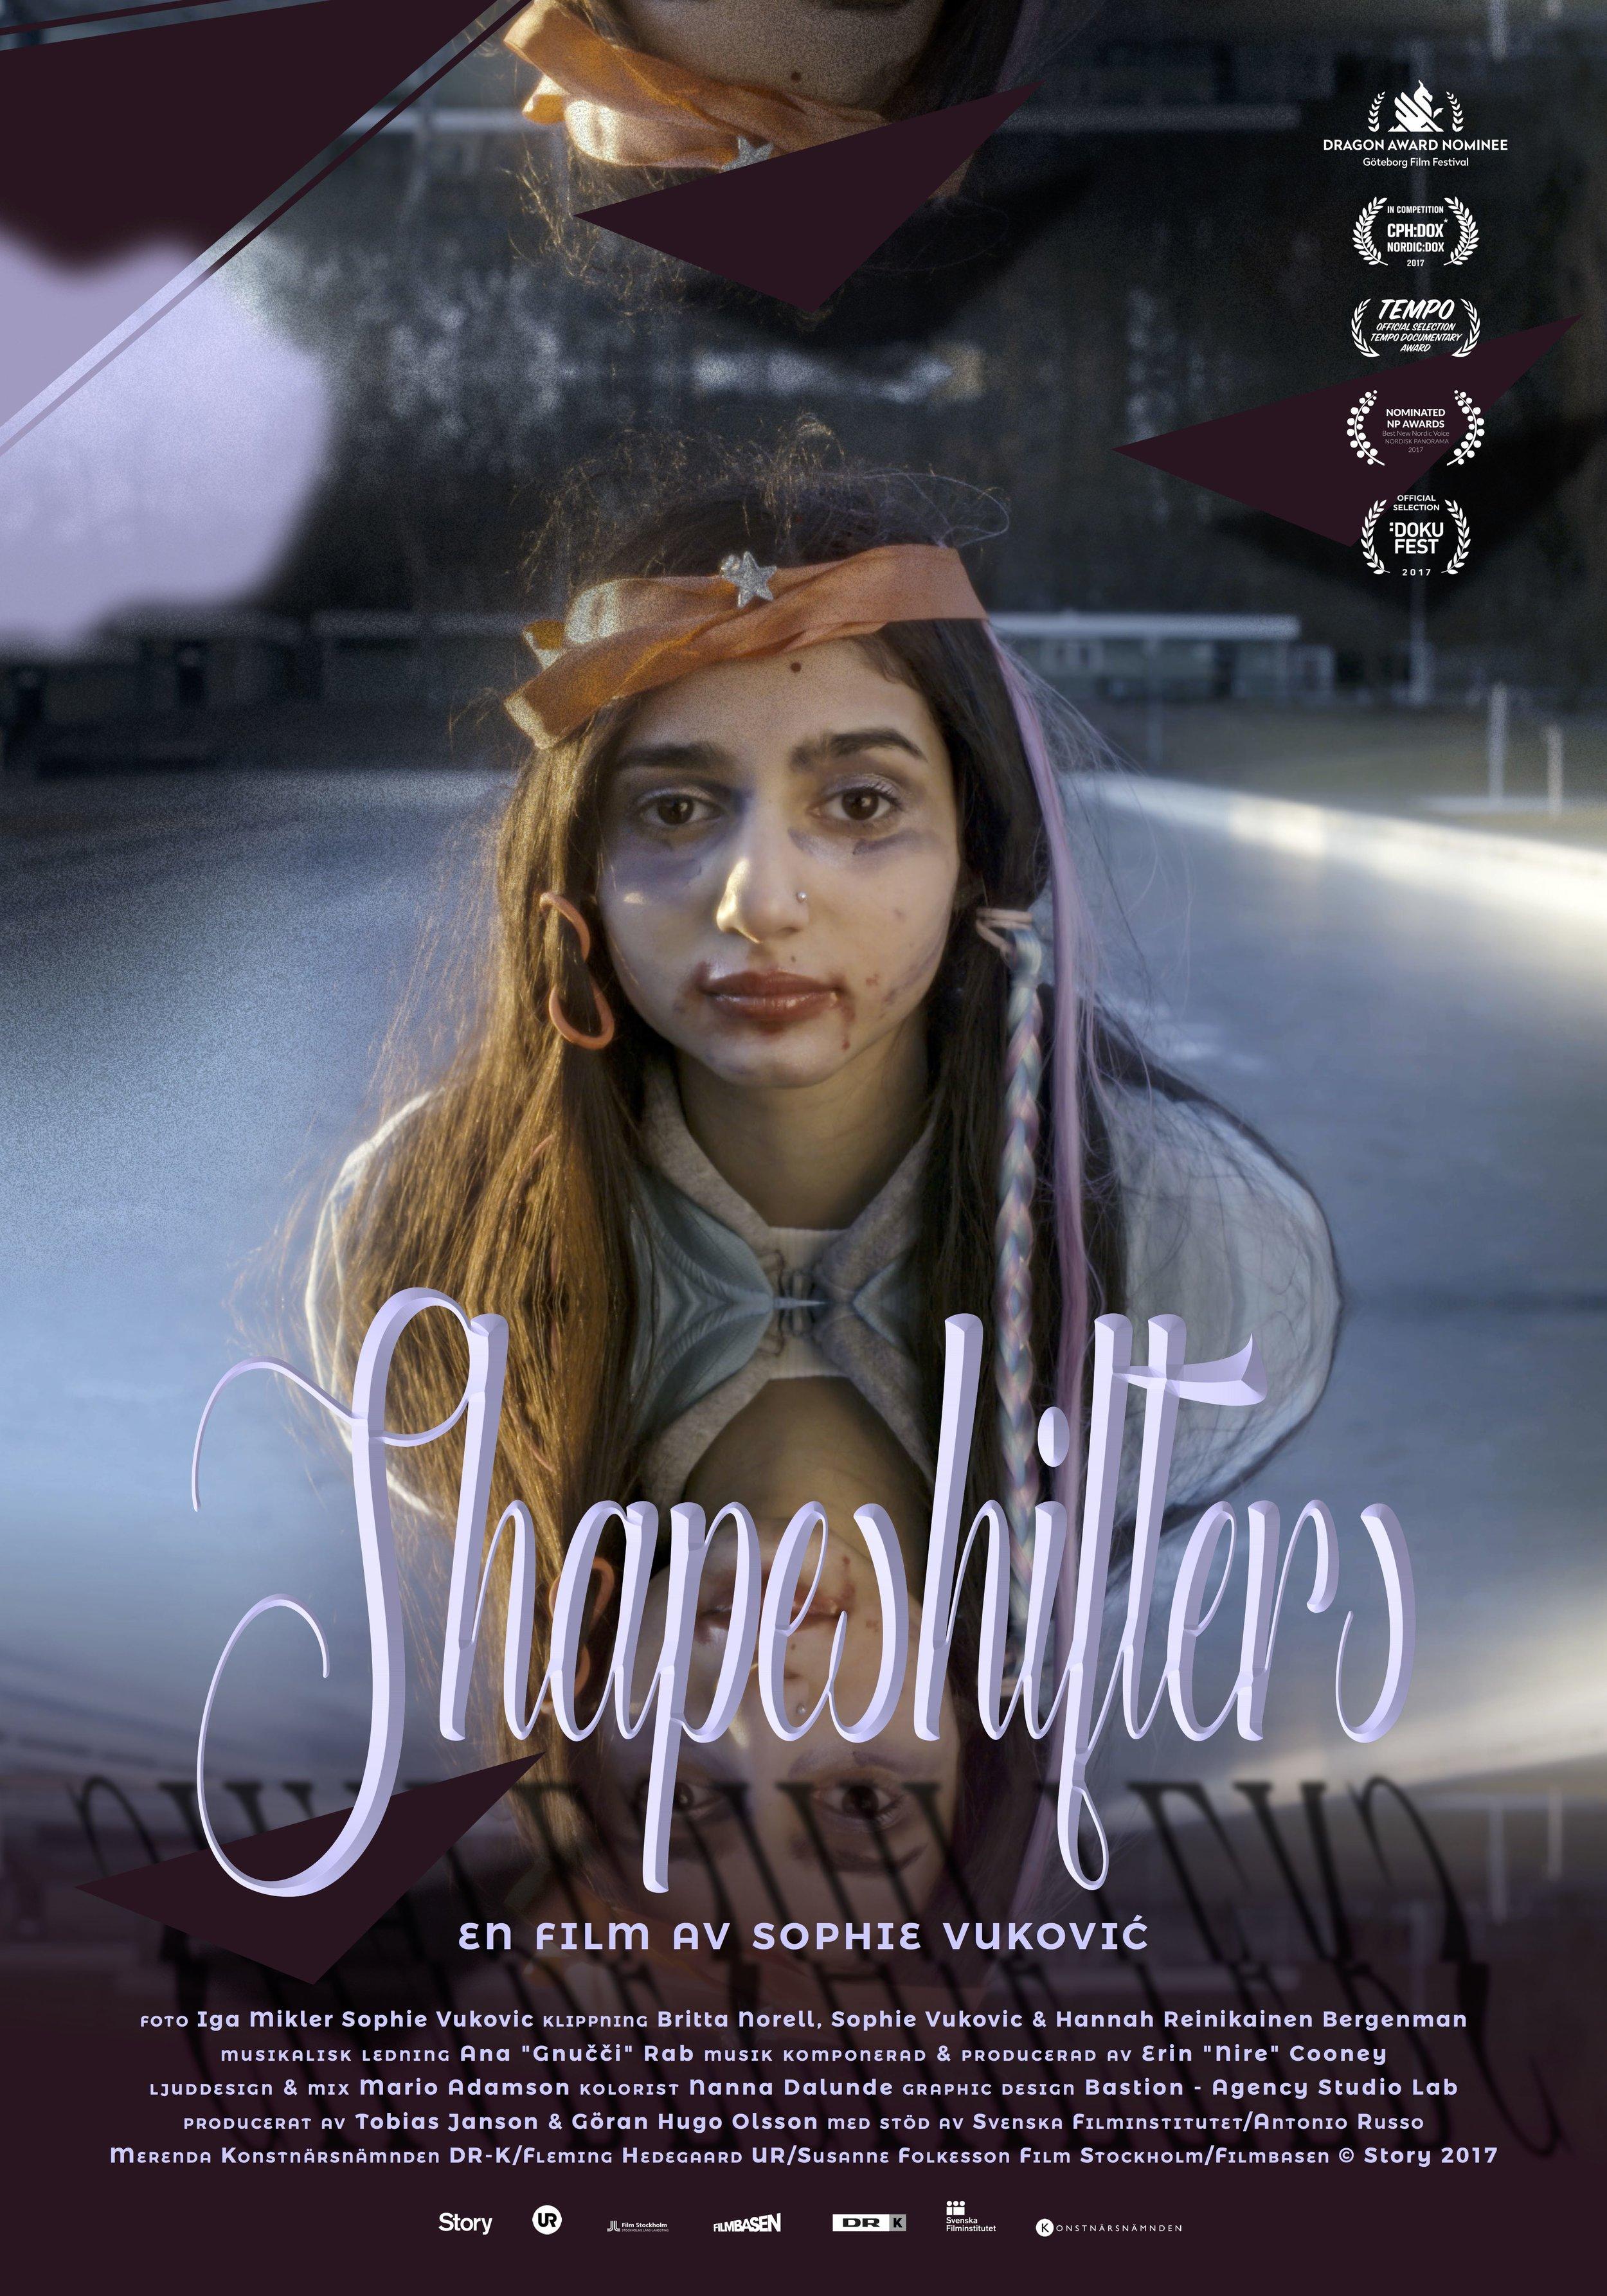 Shapeshifters poster 22aug17 70 x 100 kopia.jpg